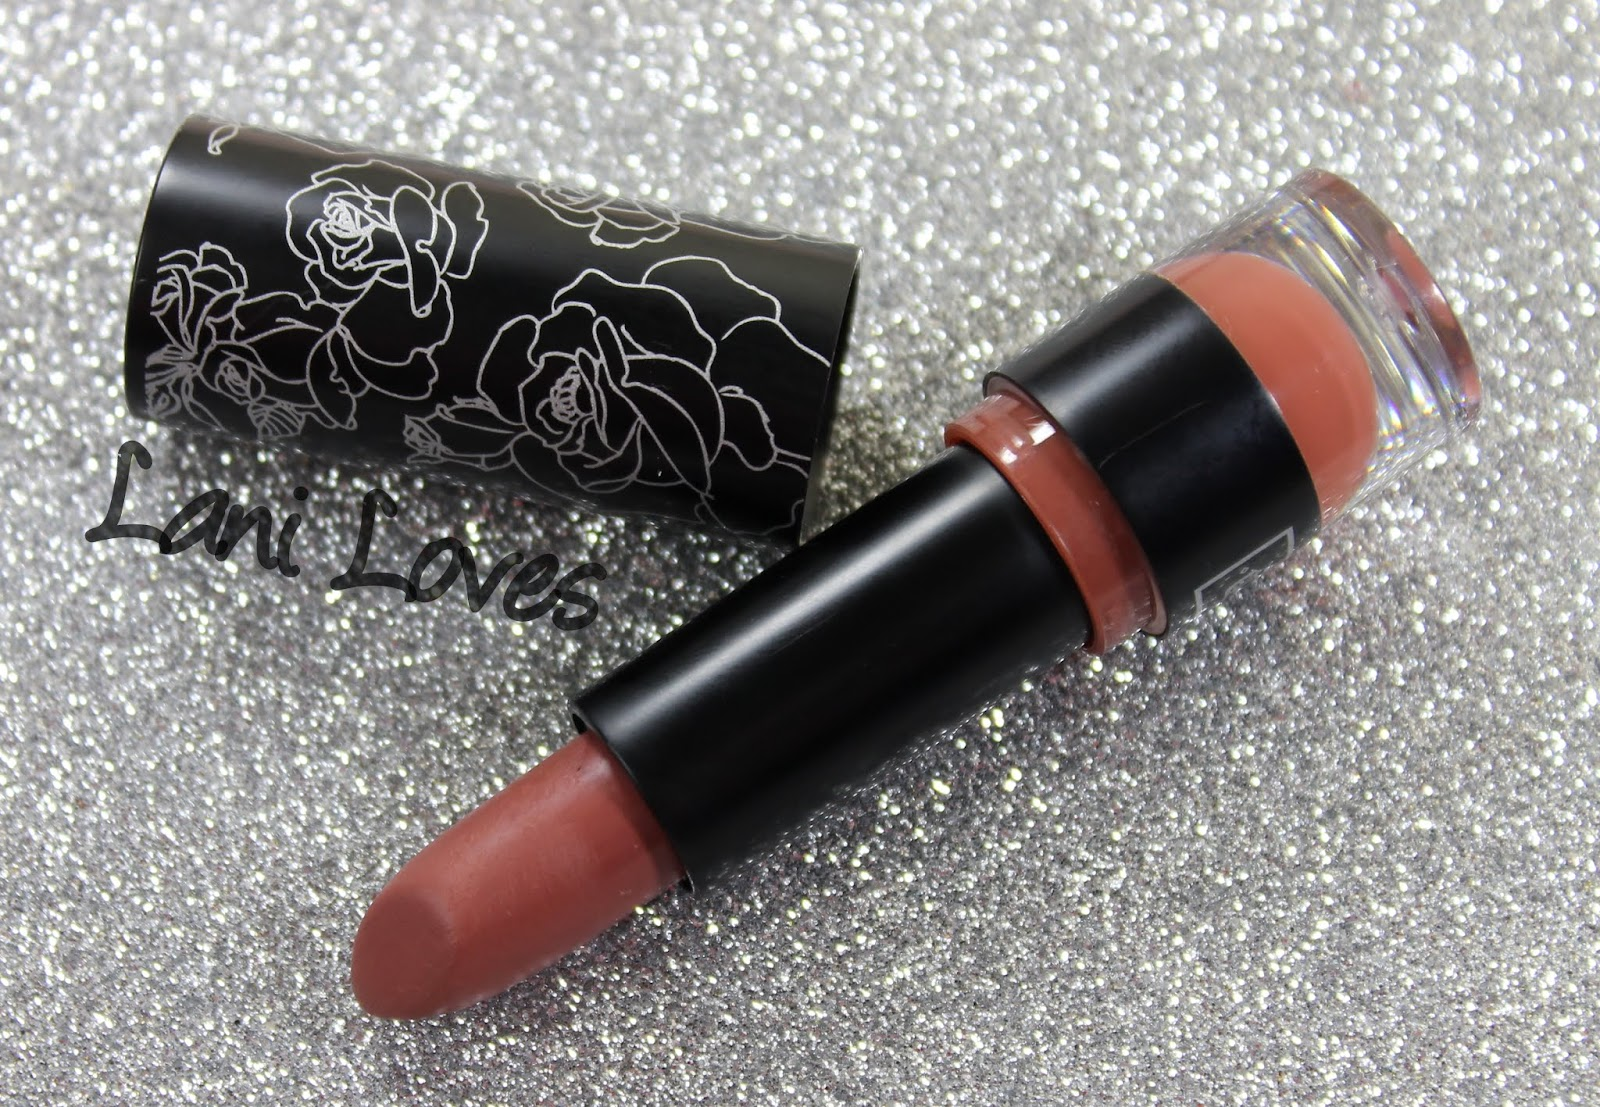 Kat Von D Painted Love Lipstick - Lolita Swatches & Review